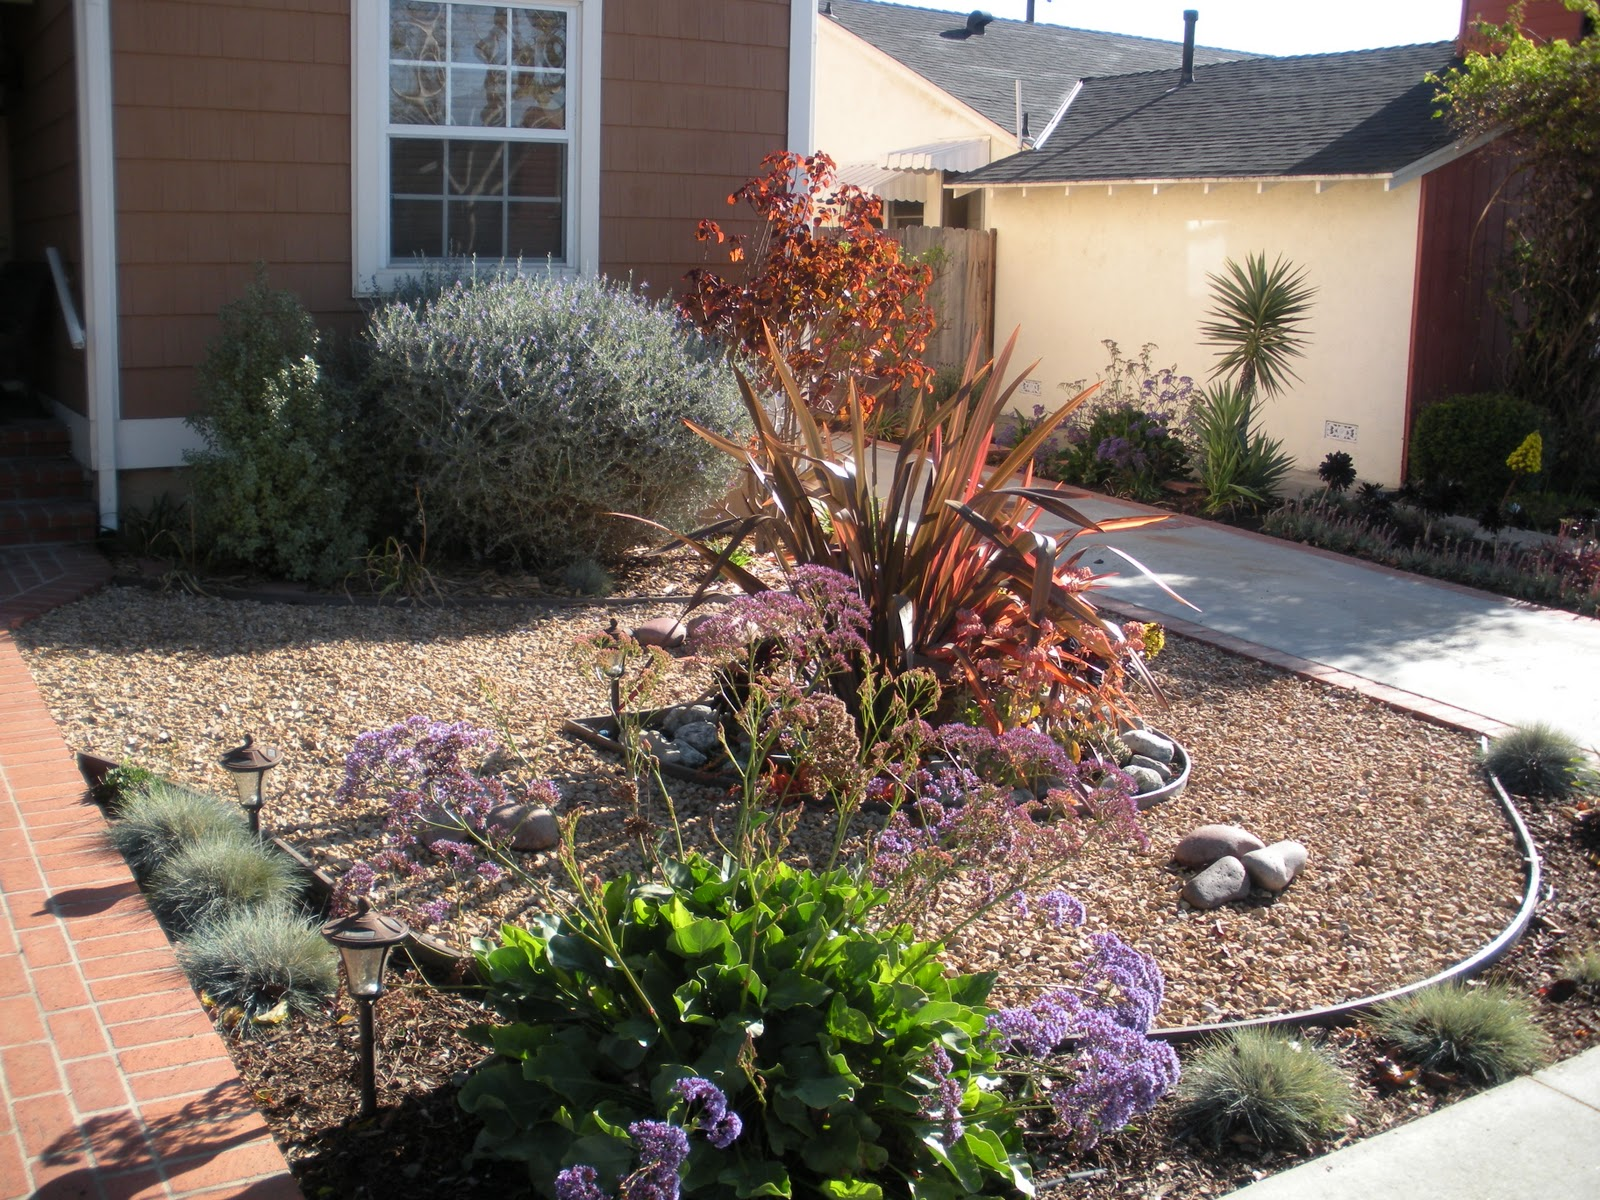 2018 mar vista green garden showcase 3622 coolidge avenue - Drought tolerant landscaping ideas ...